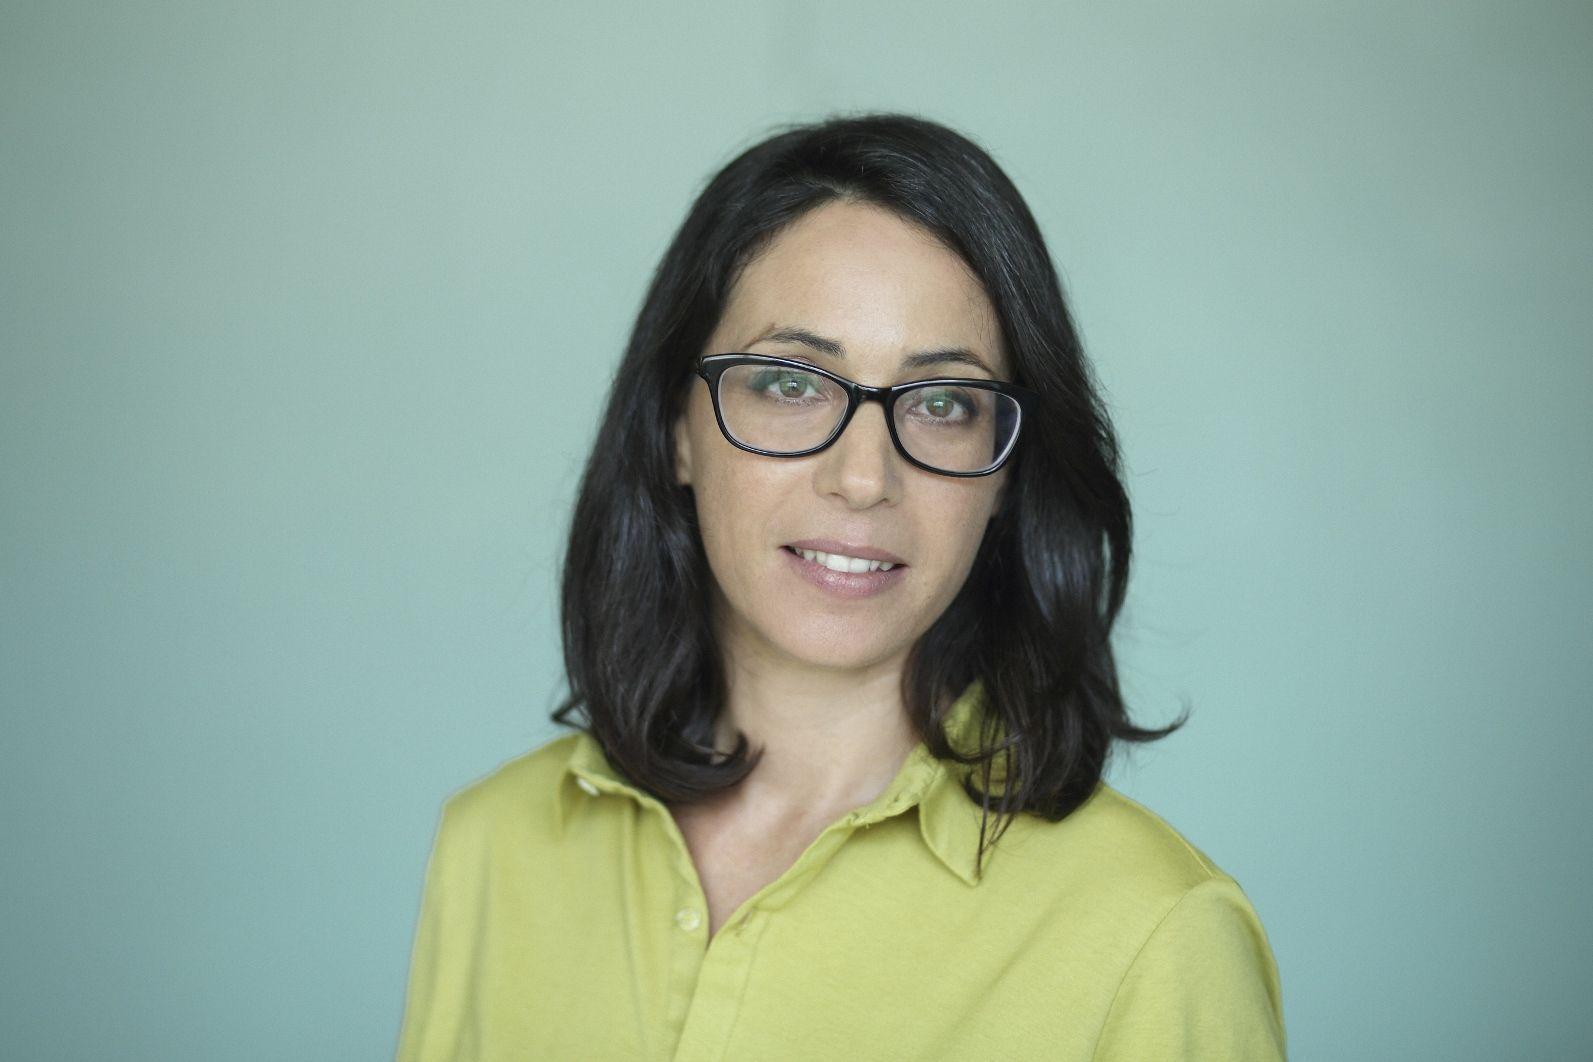 Yael Cohen of Justine Hats. Photo by Yifat Verchik